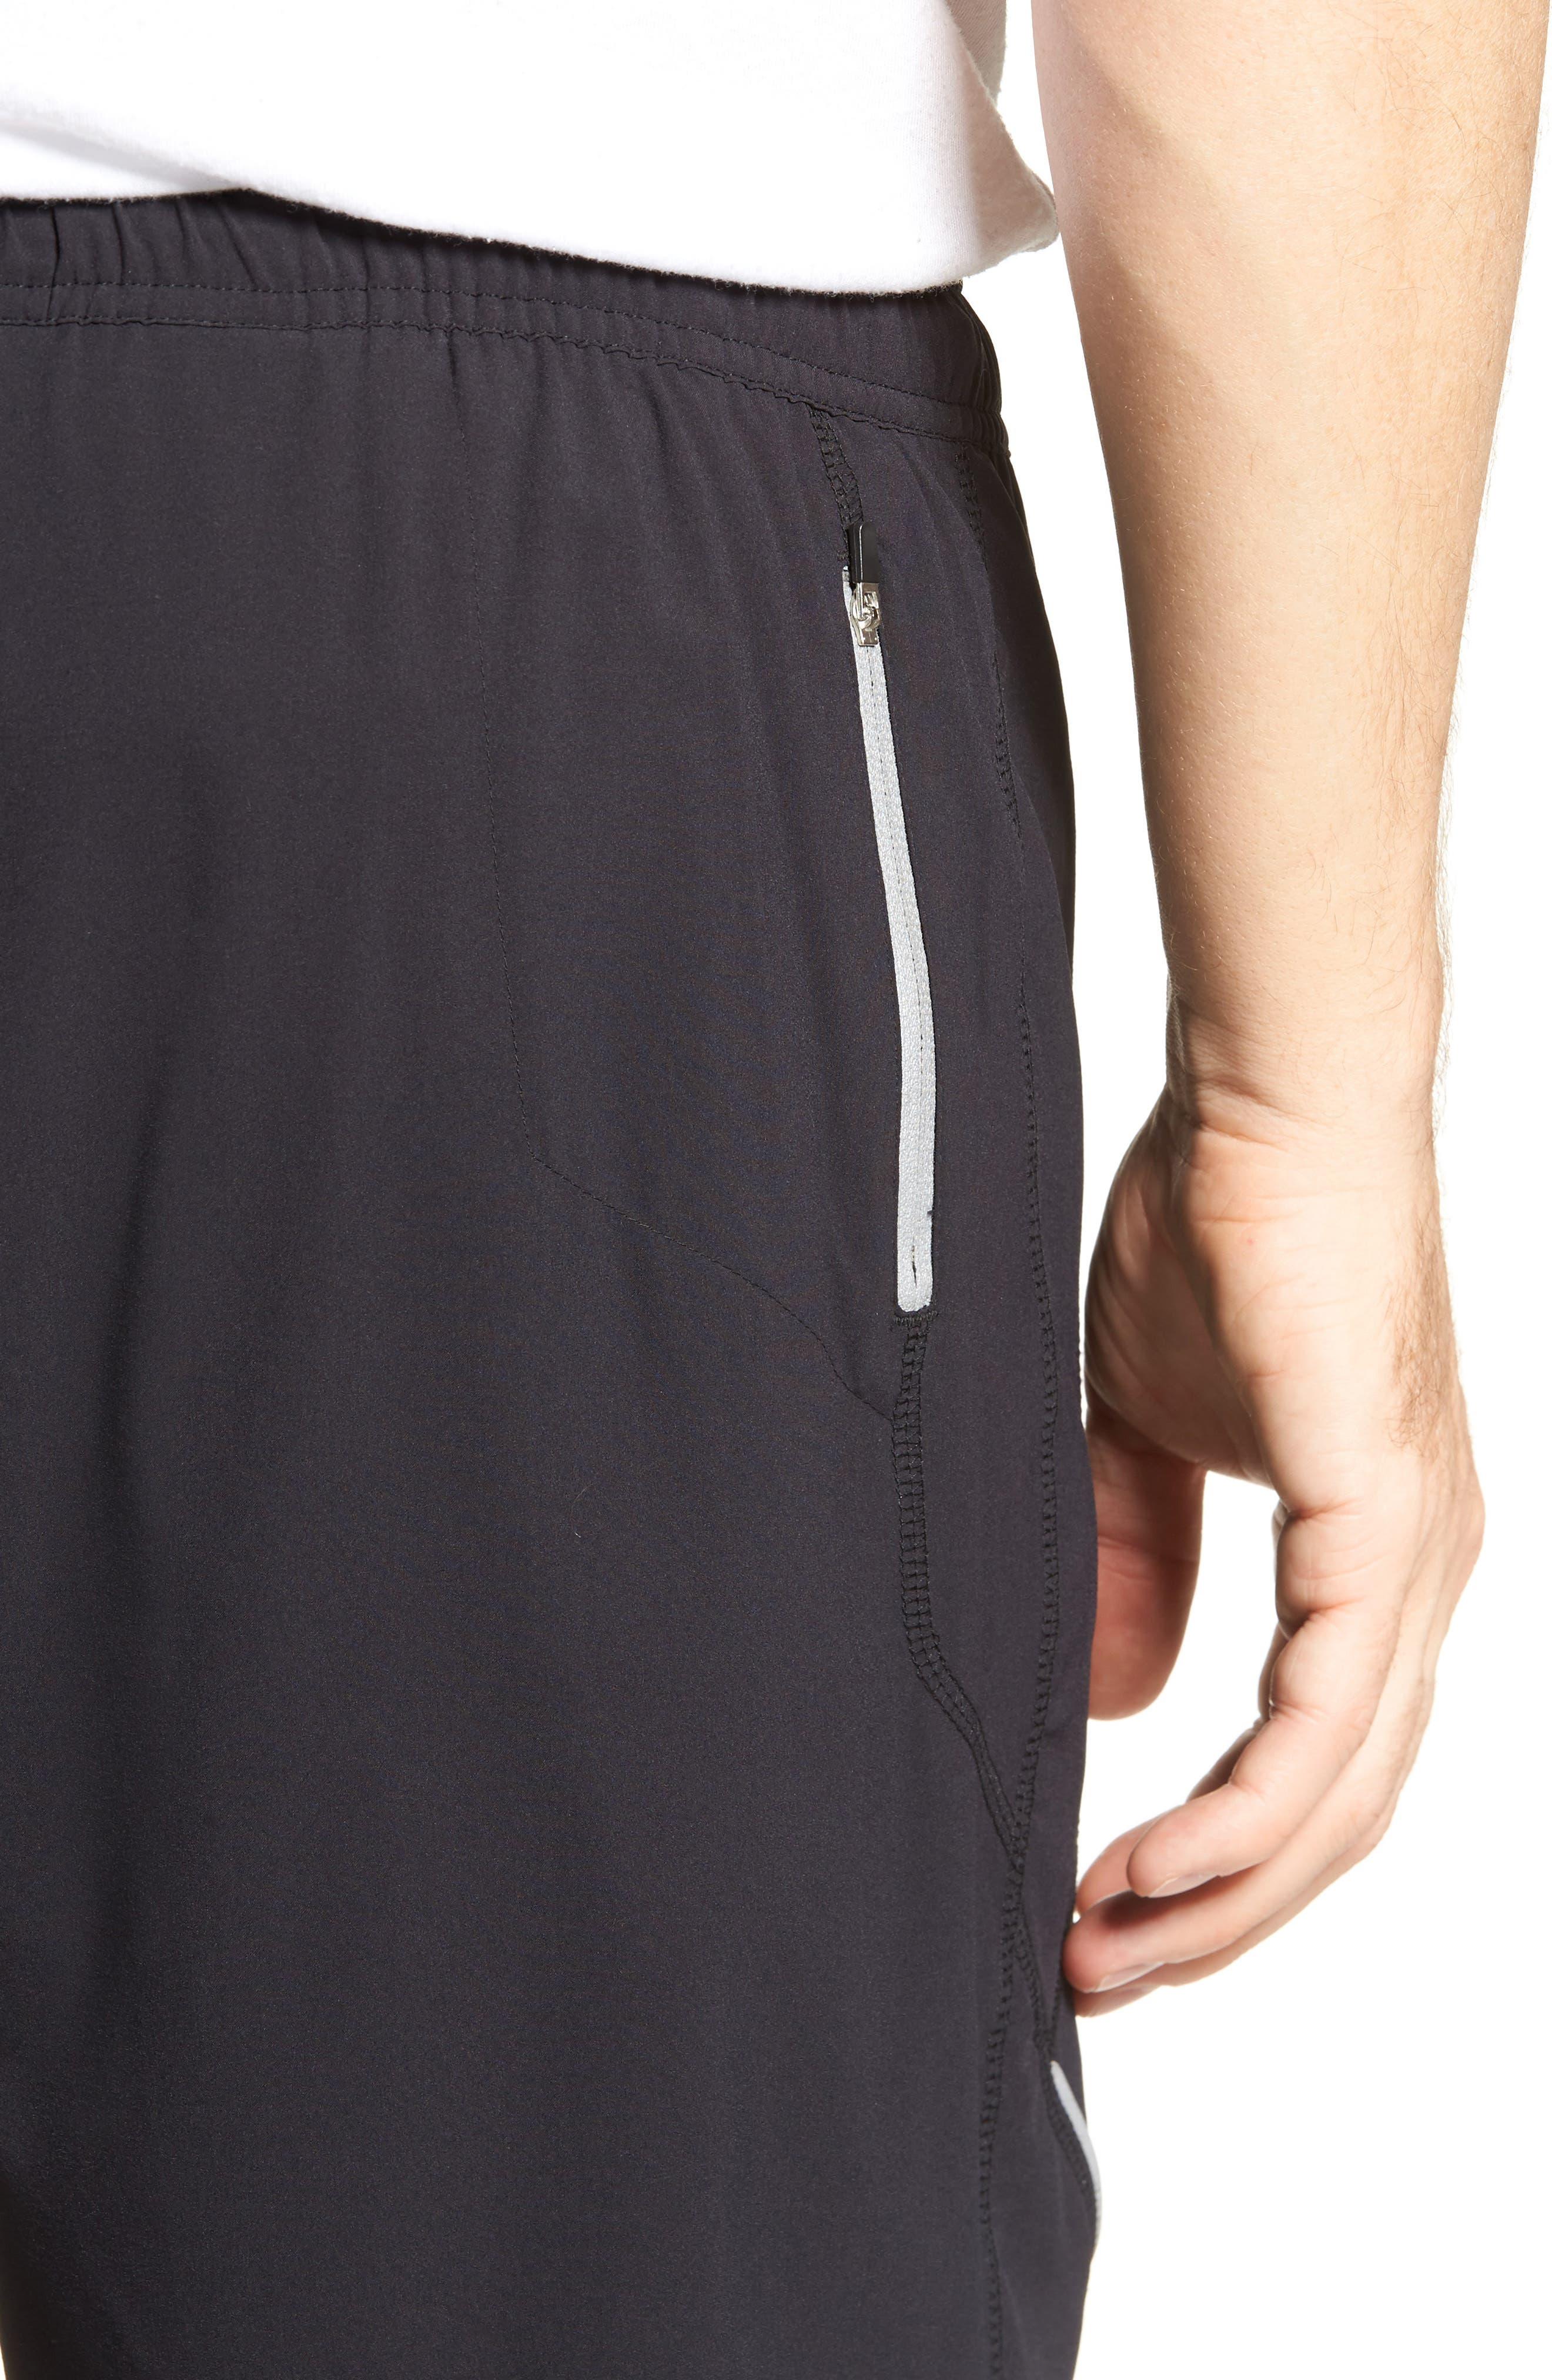 Propulsion Athletic Shorts,                             Alternate thumbnail 4, color,                             BLACK